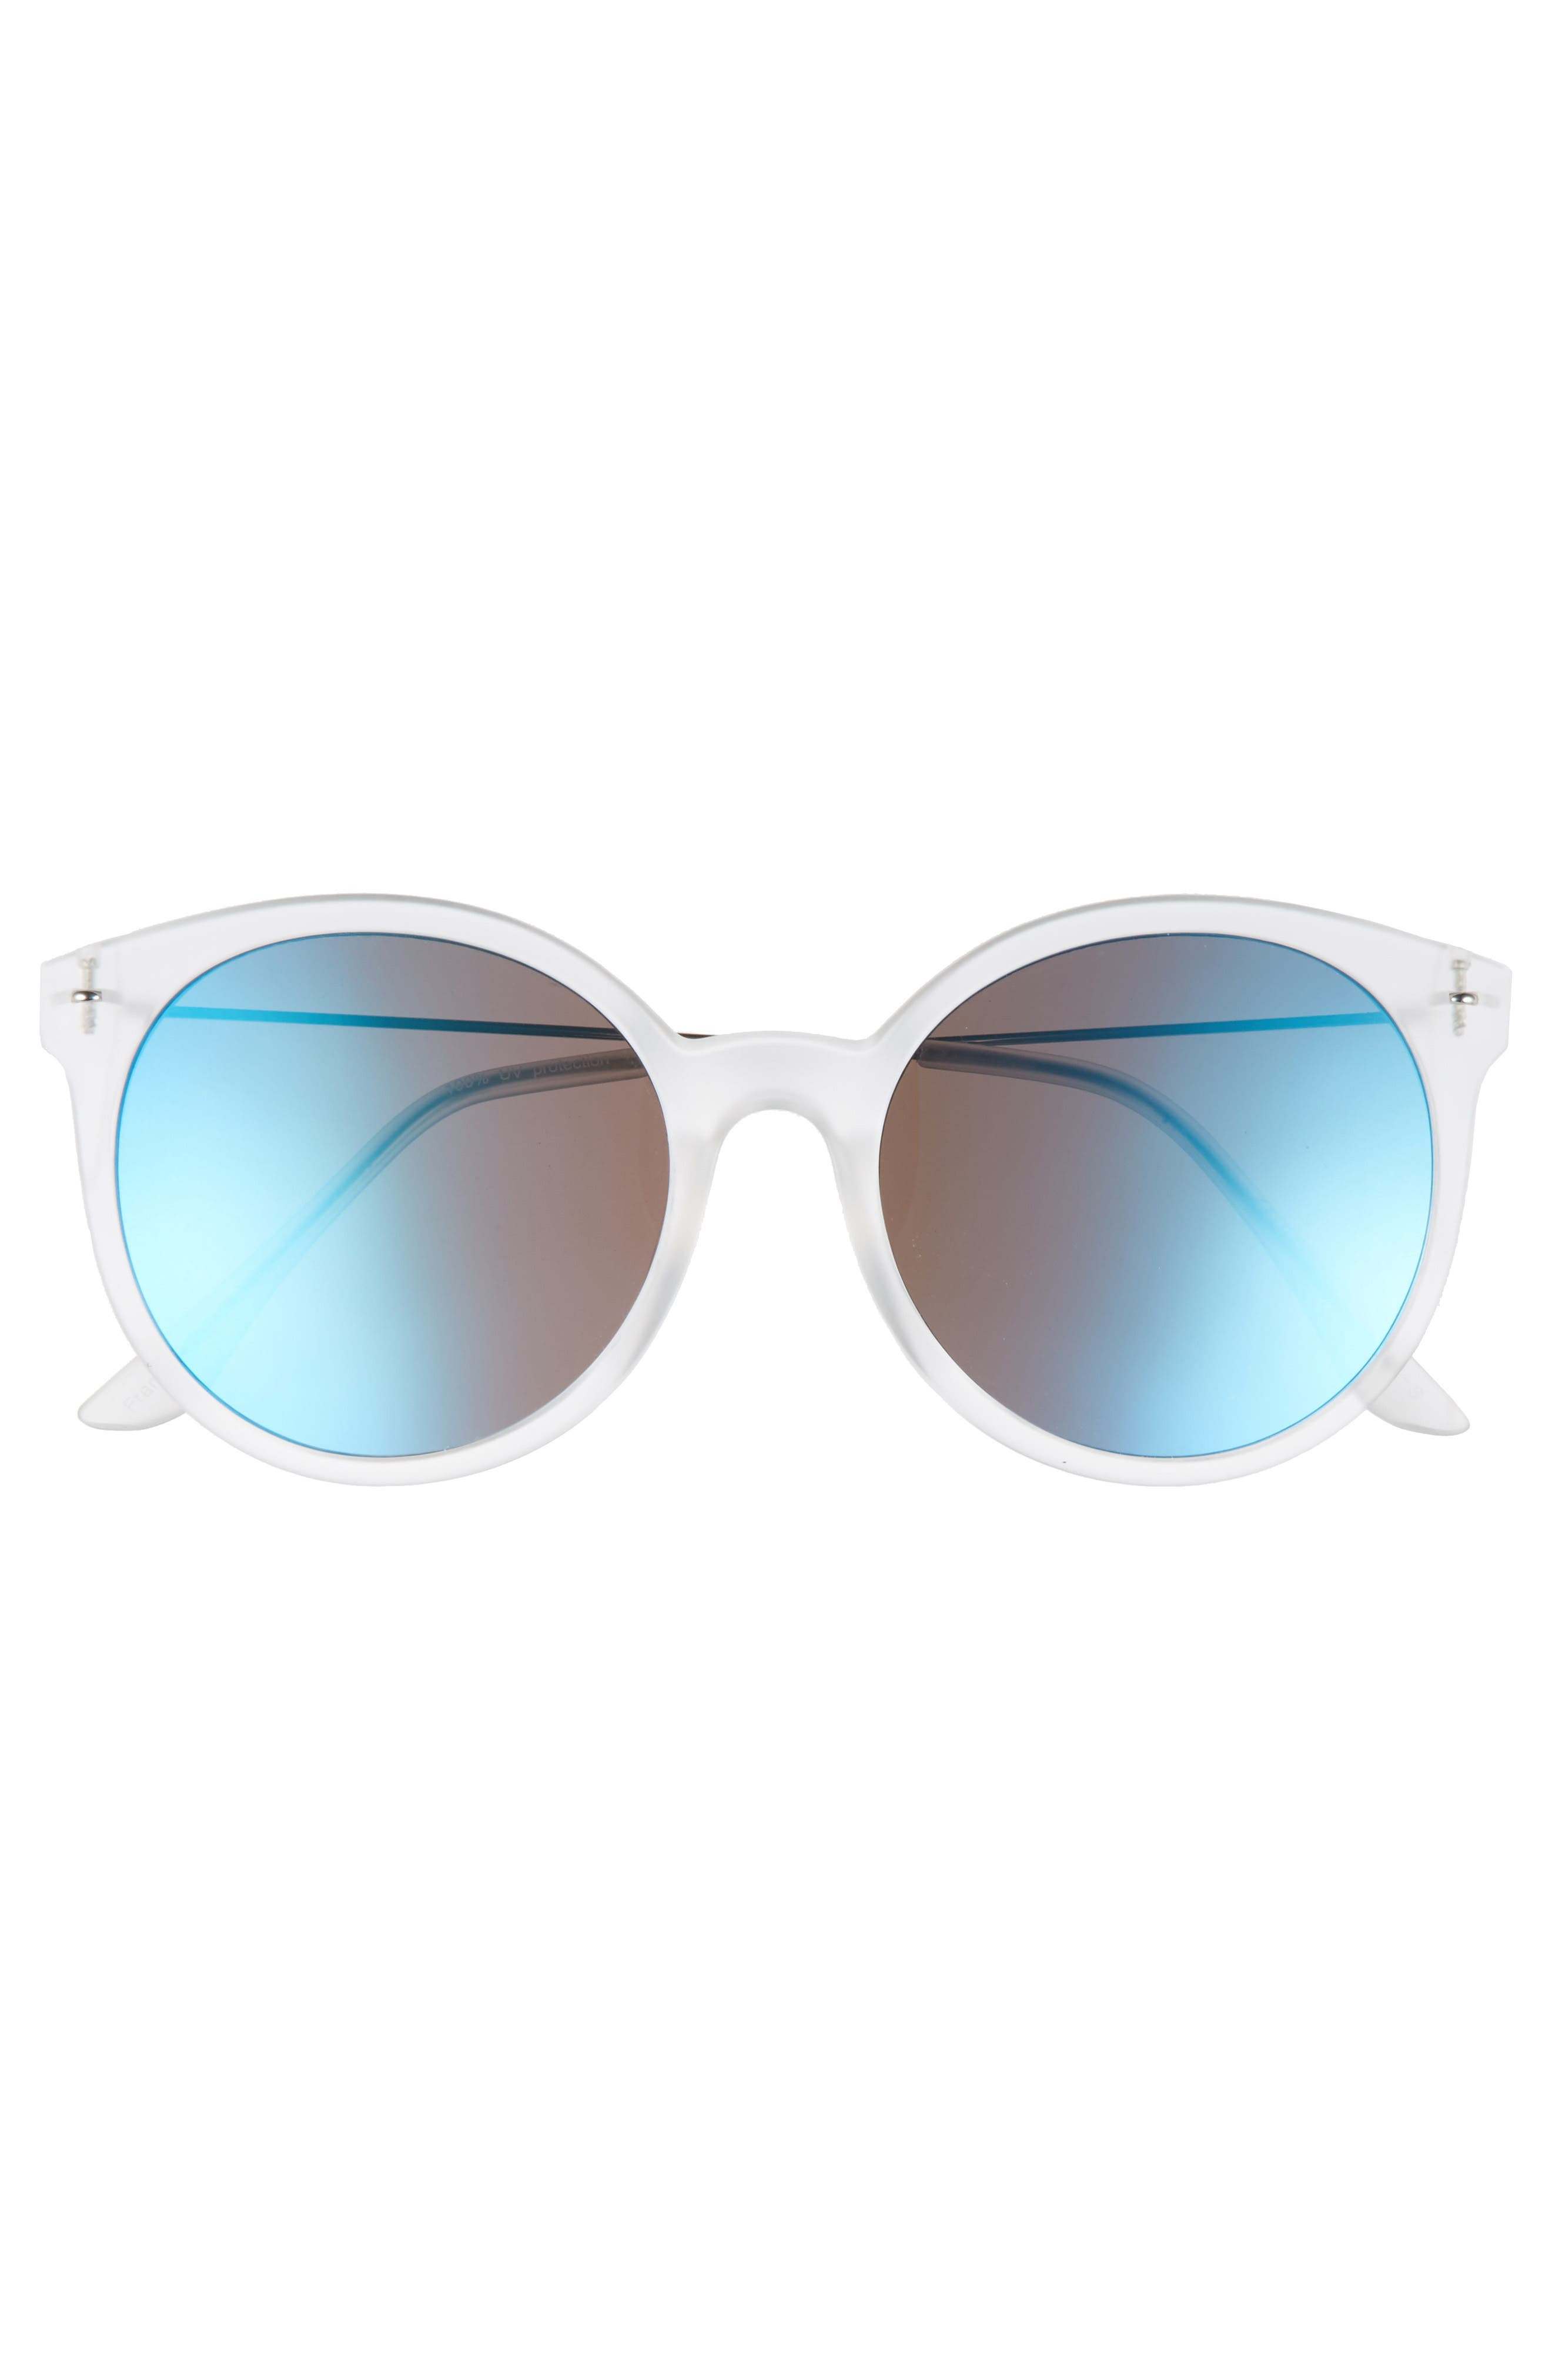 GLANCE EYEWEAR,                             62mm Transparent Round Lens Sunglasses,                             Alternate thumbnail 3, color,                             100